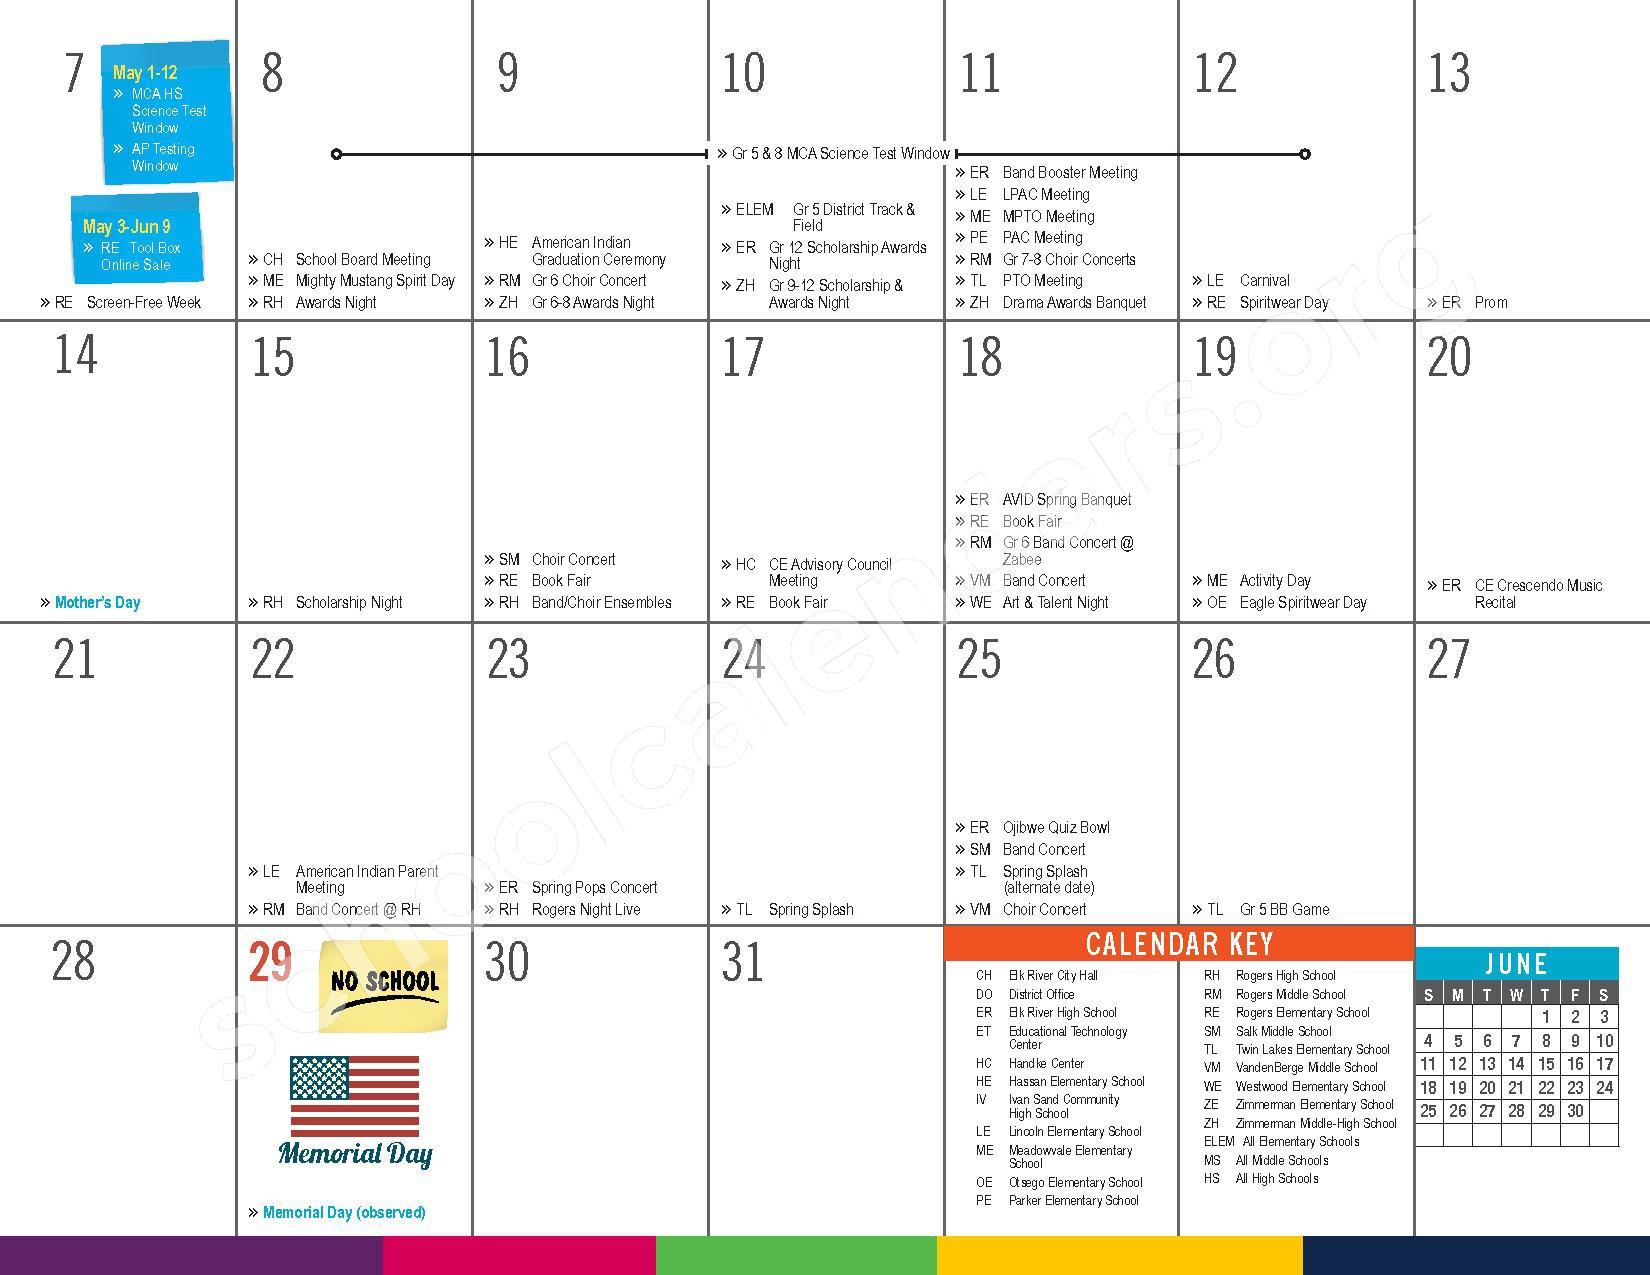 2016 - 2017 District Calendar – Vandenberge Middle School – page 23